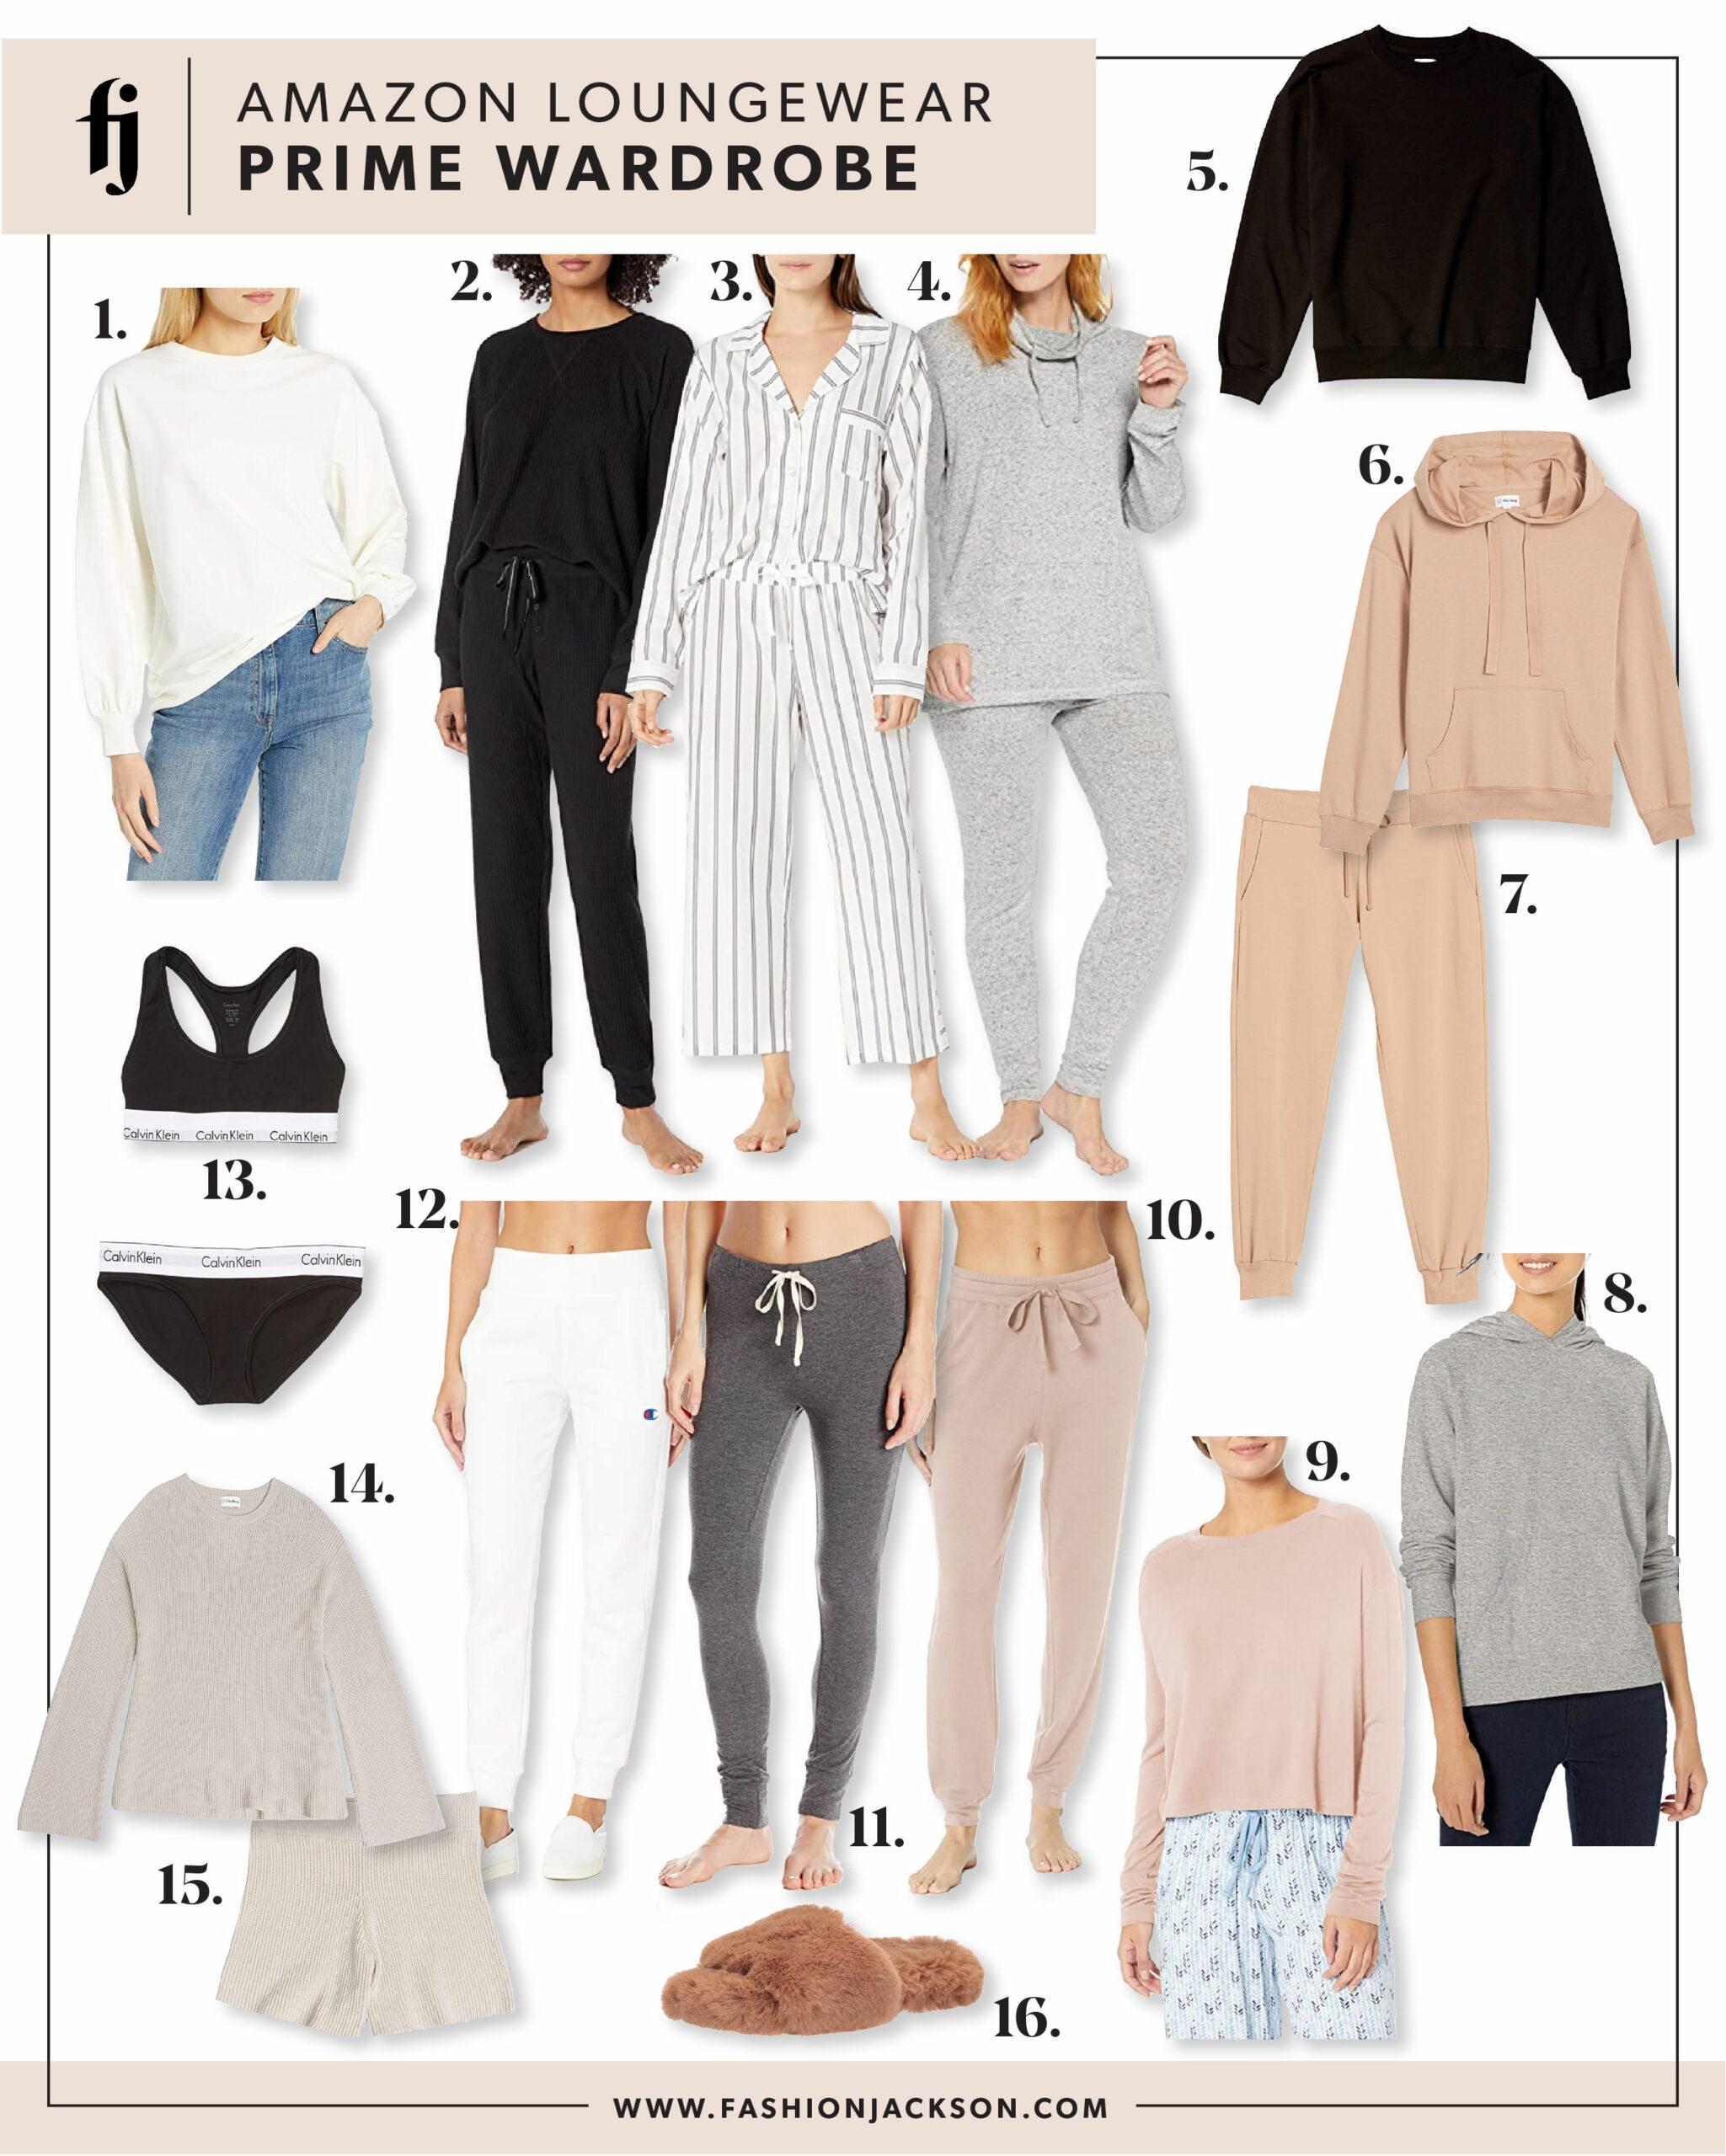 Amazon Prime Wardrobe Loungewear